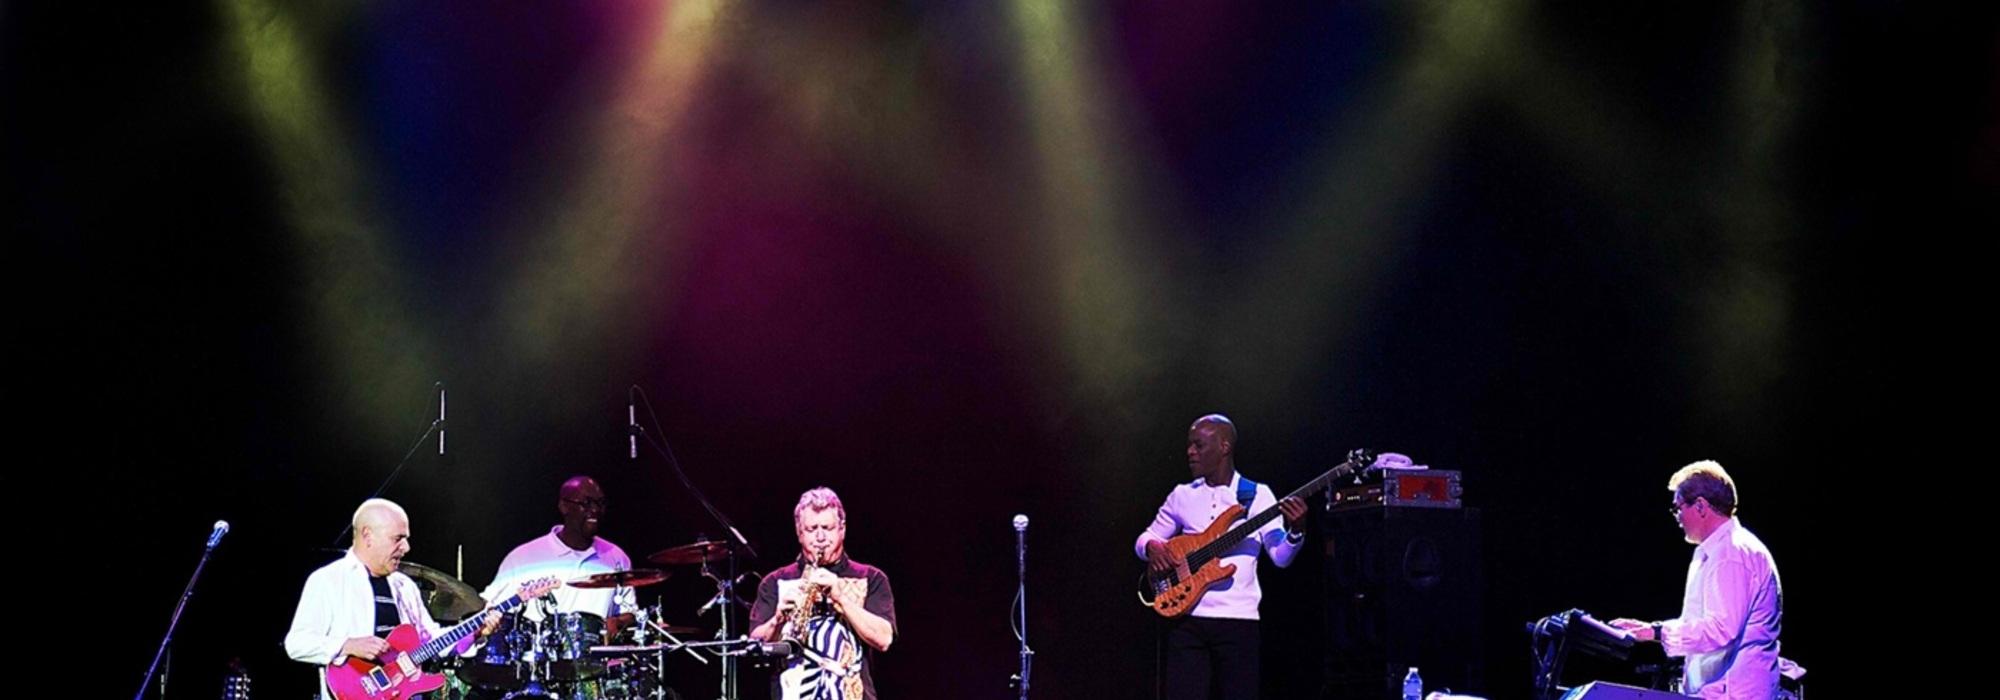 A Berks Jazz Fest live event